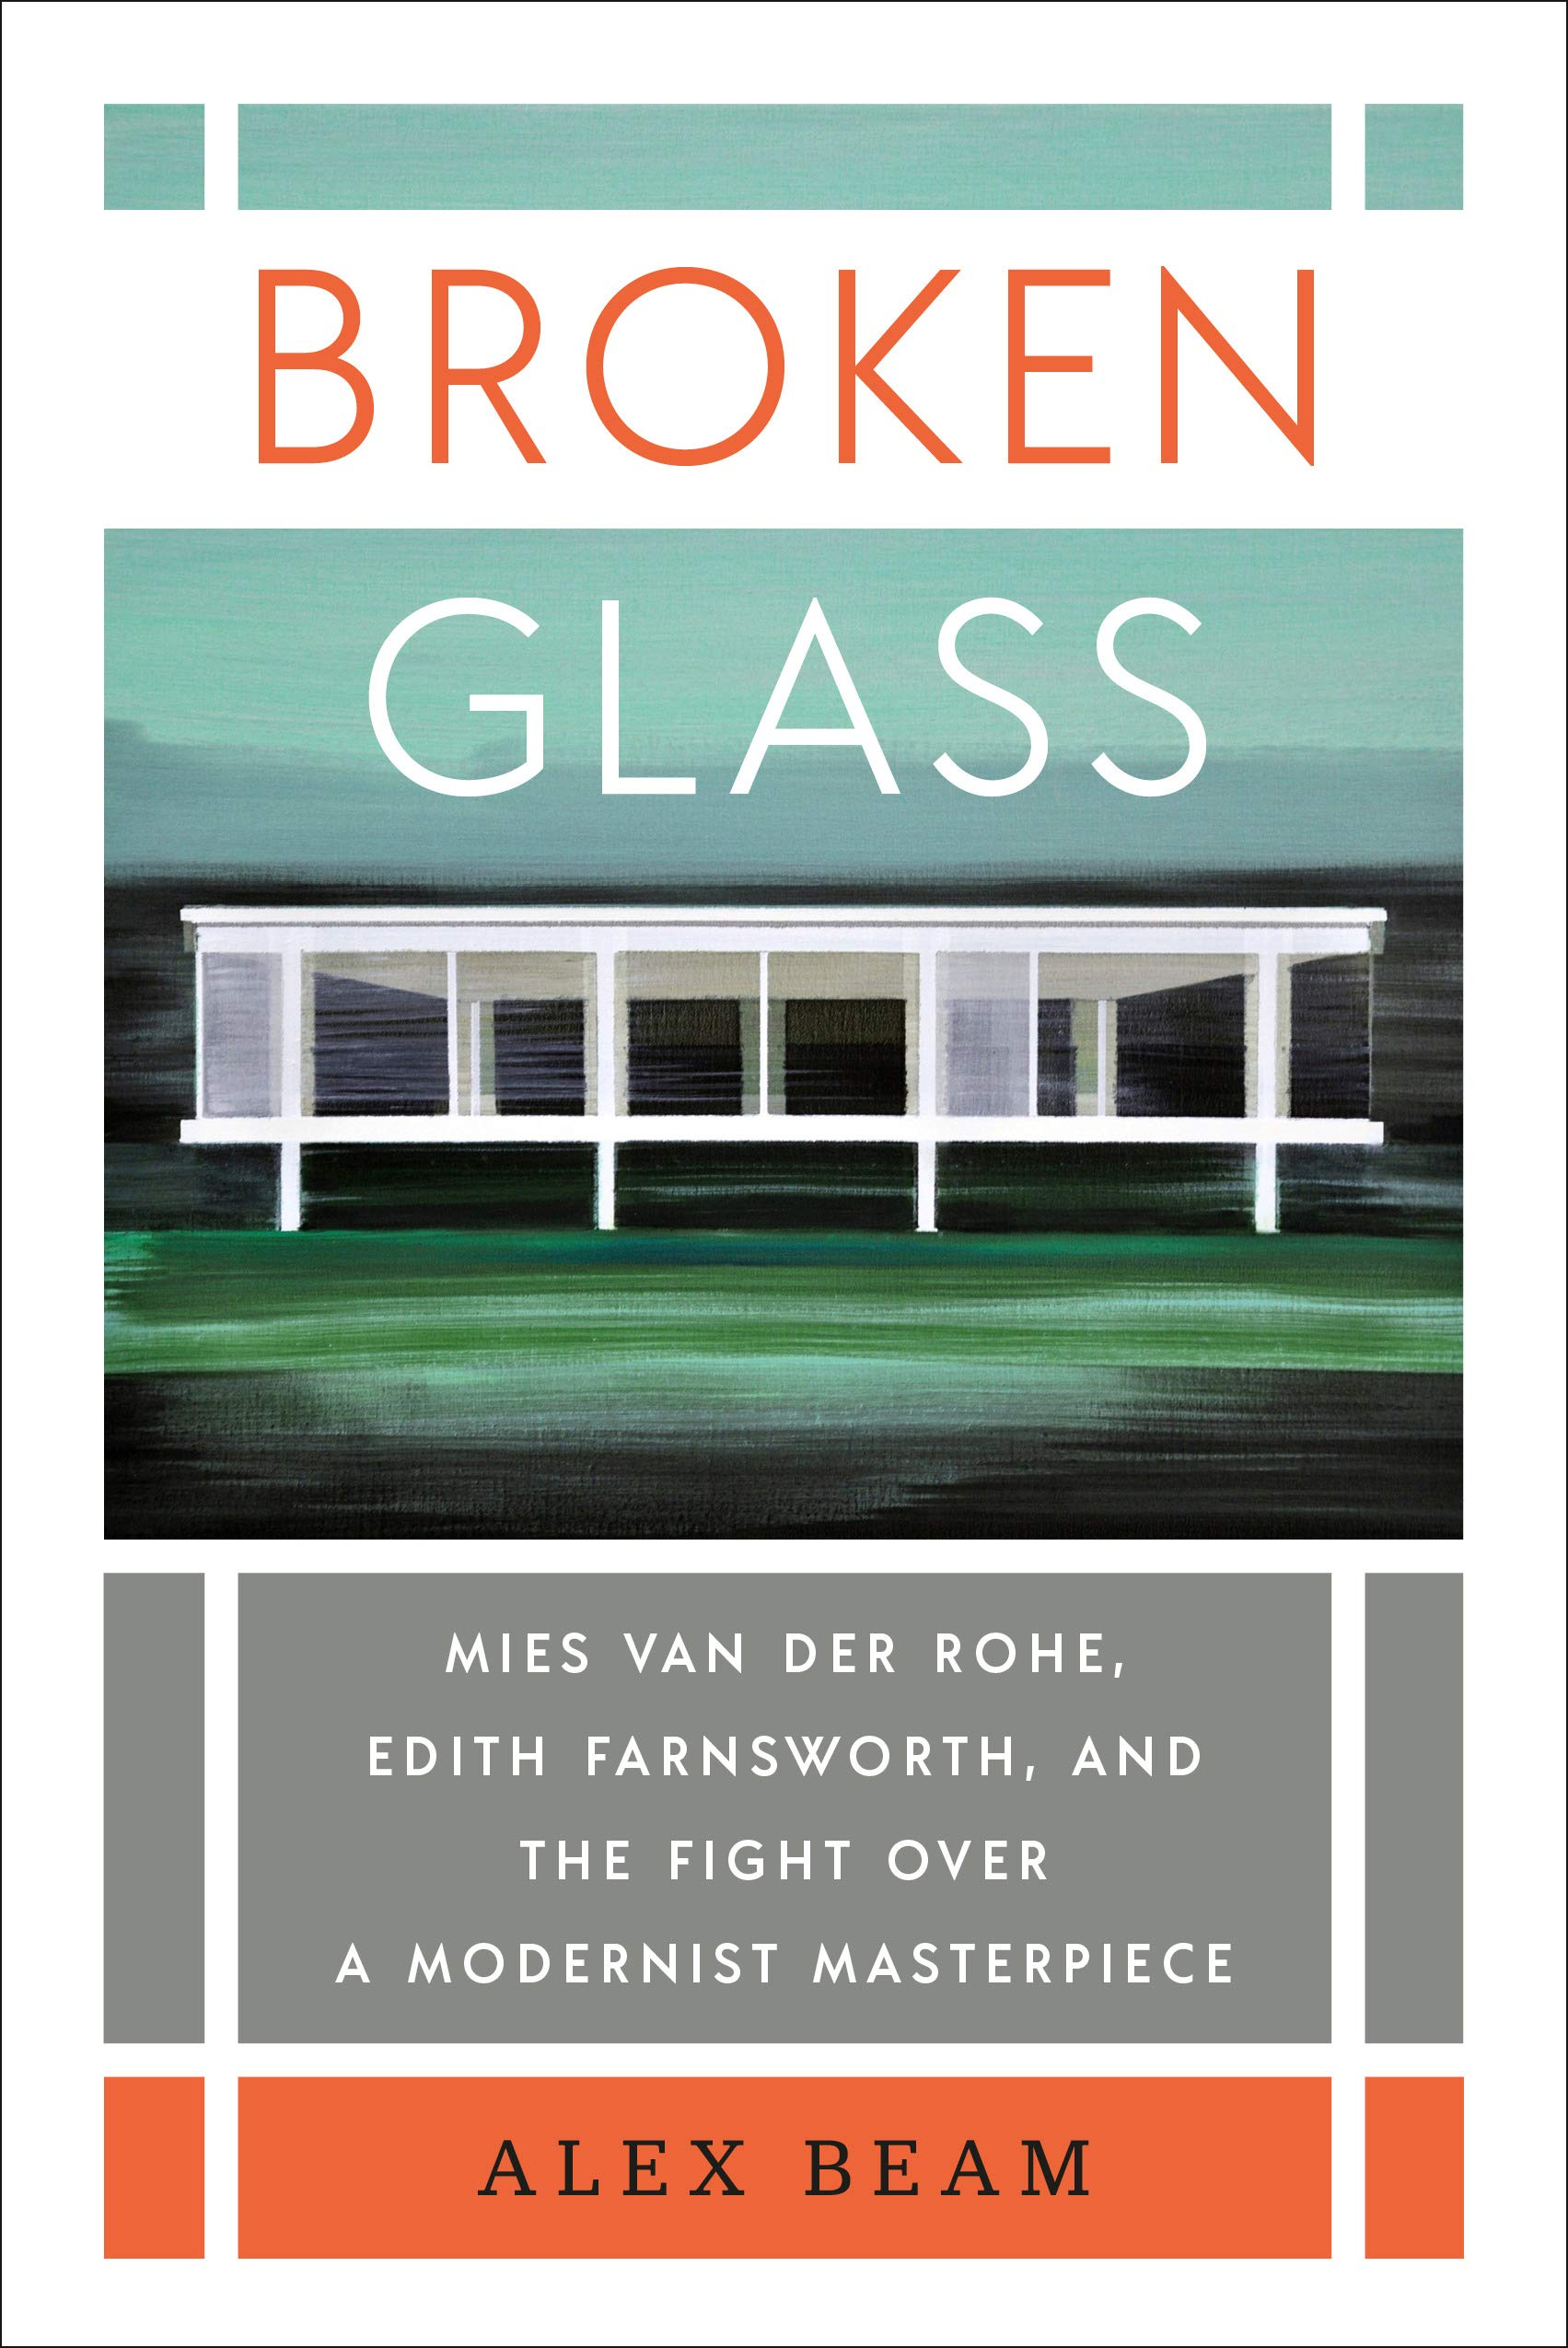 Mies Van Der Rohe Design Philosophy.Broken Glass Mies Van Der Rohe Edith Farnsworth And The Fight